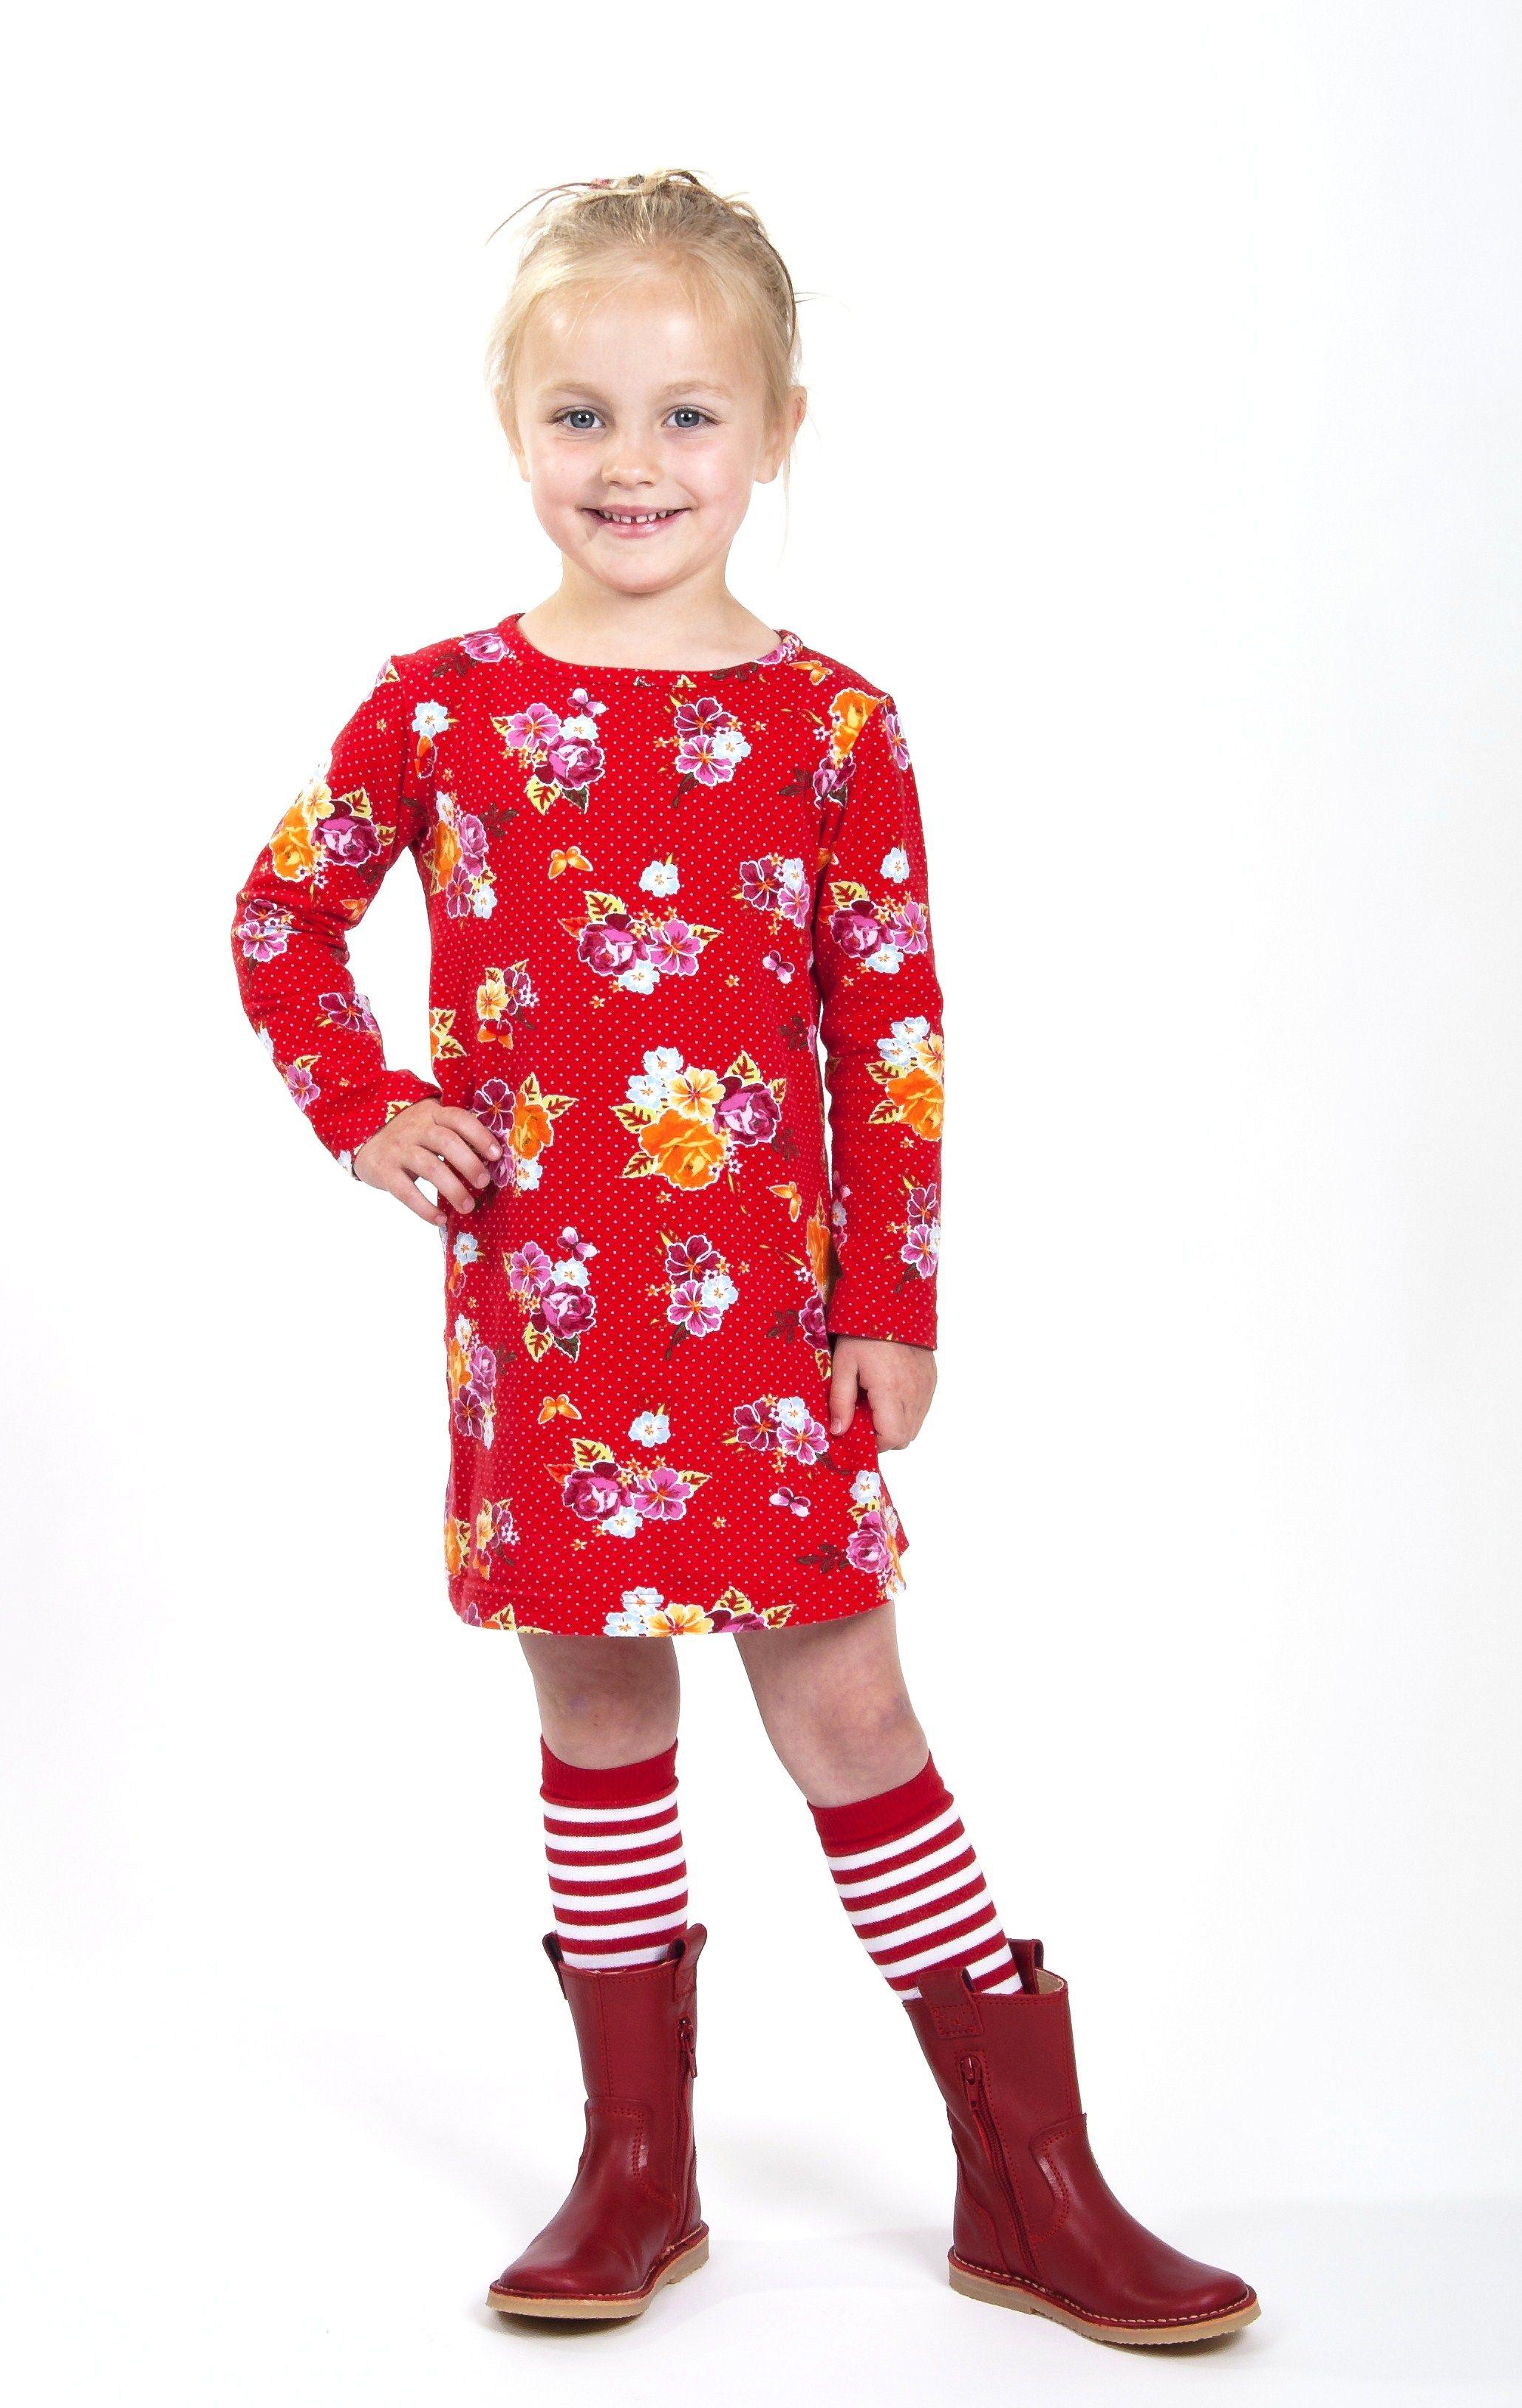 Rode Tricot Jurk.Skinny Dress Rode Stip En Rozenprint Super Zacht Tricot Skinny